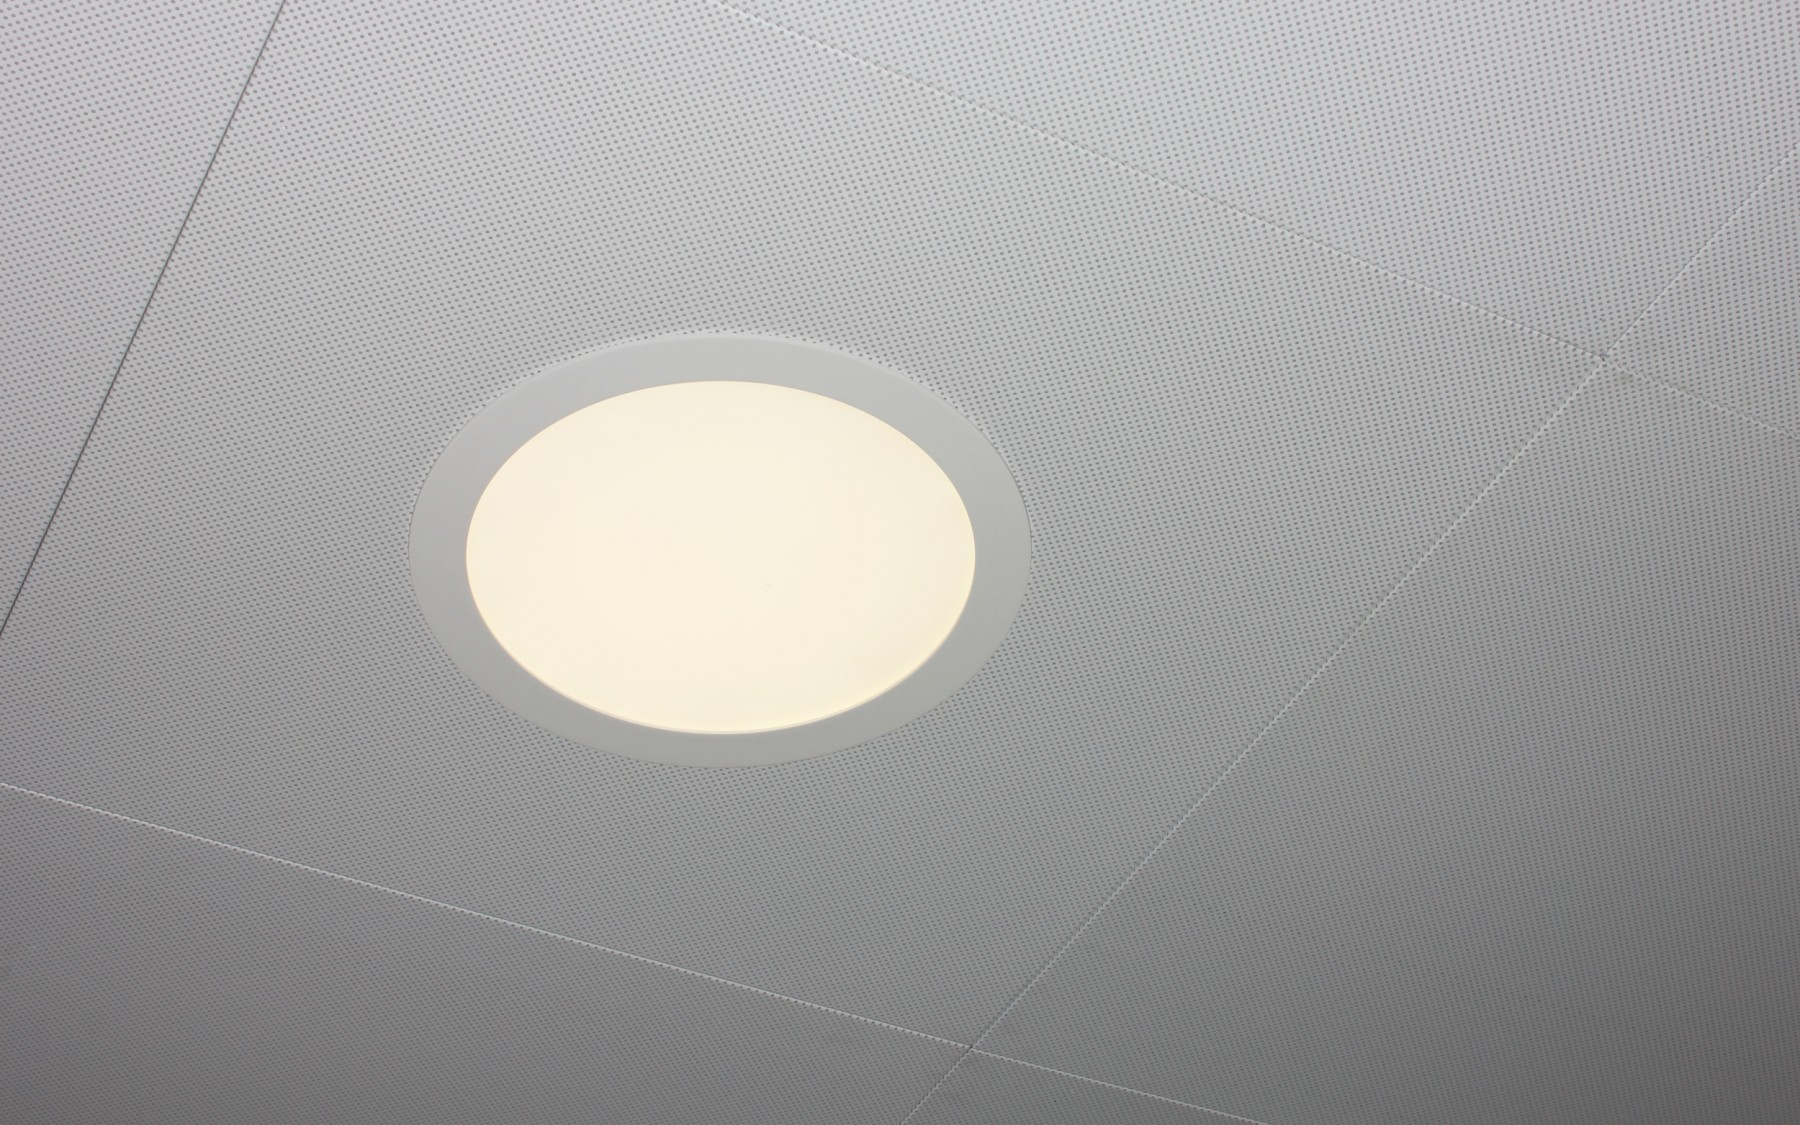 LED, round spot